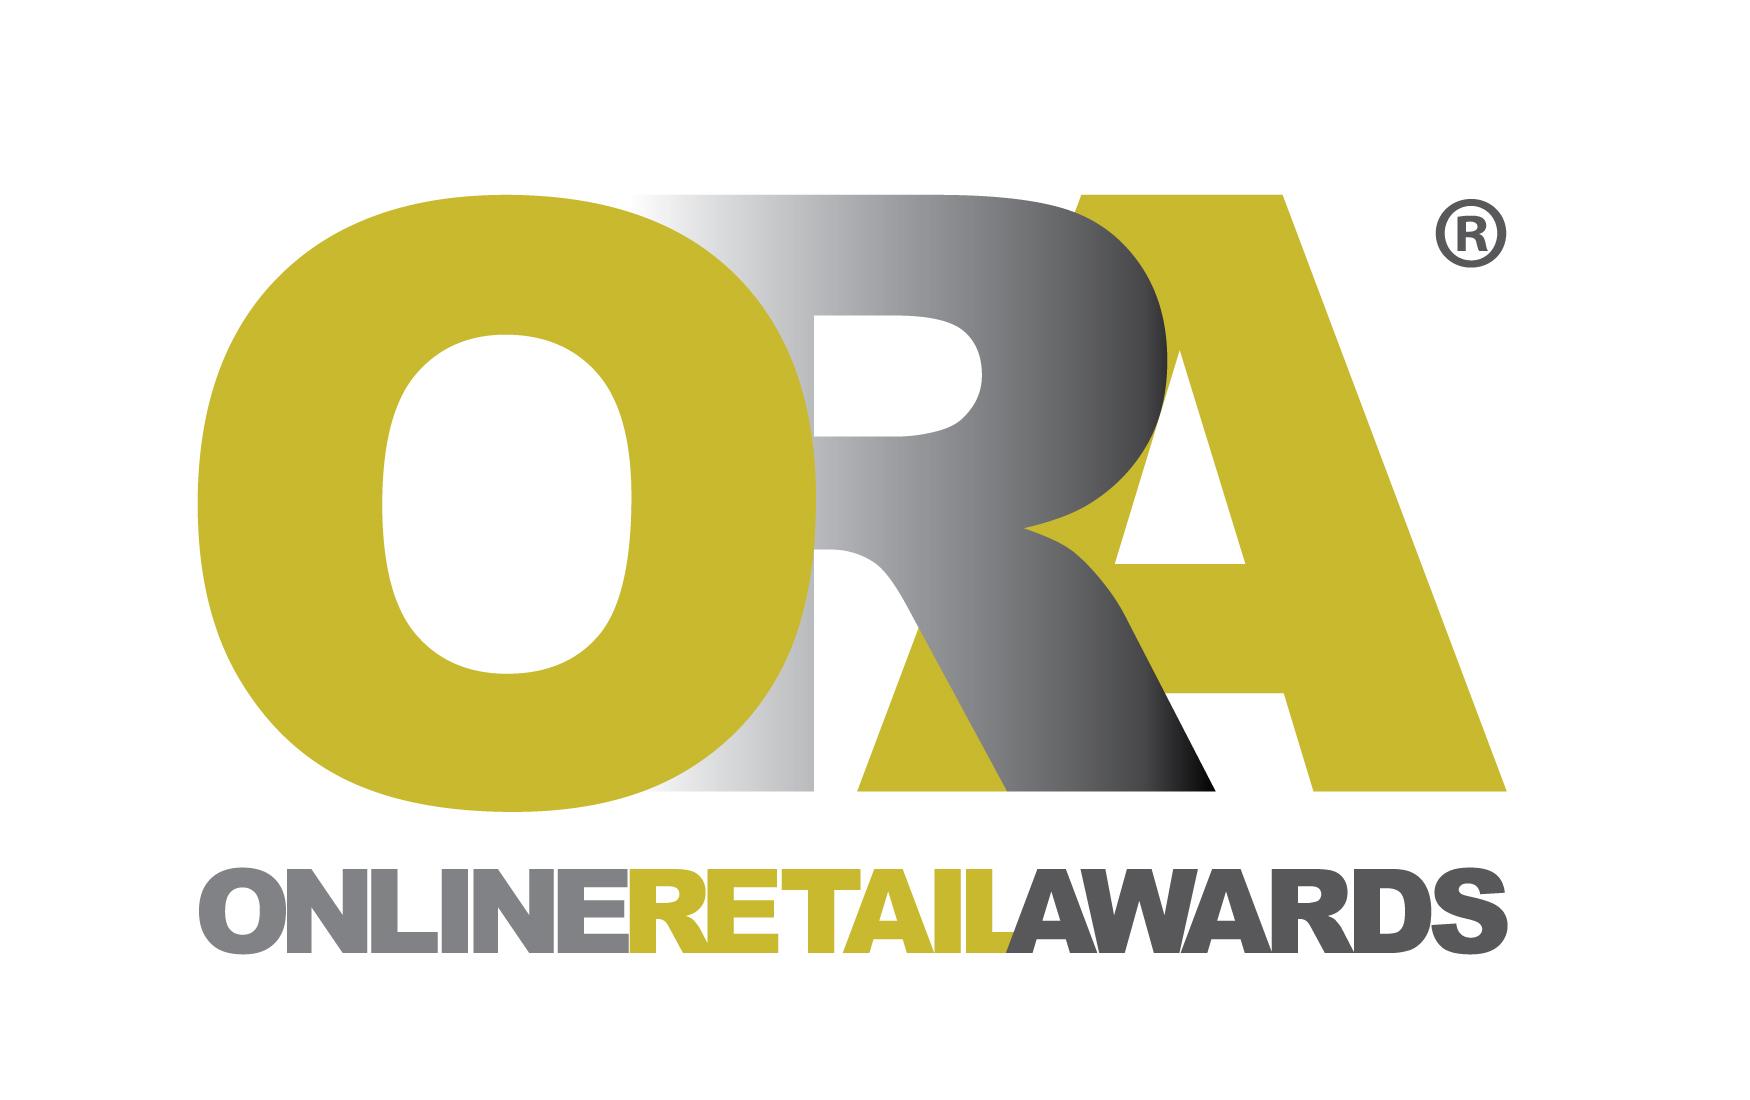 Online Retail Awards winner